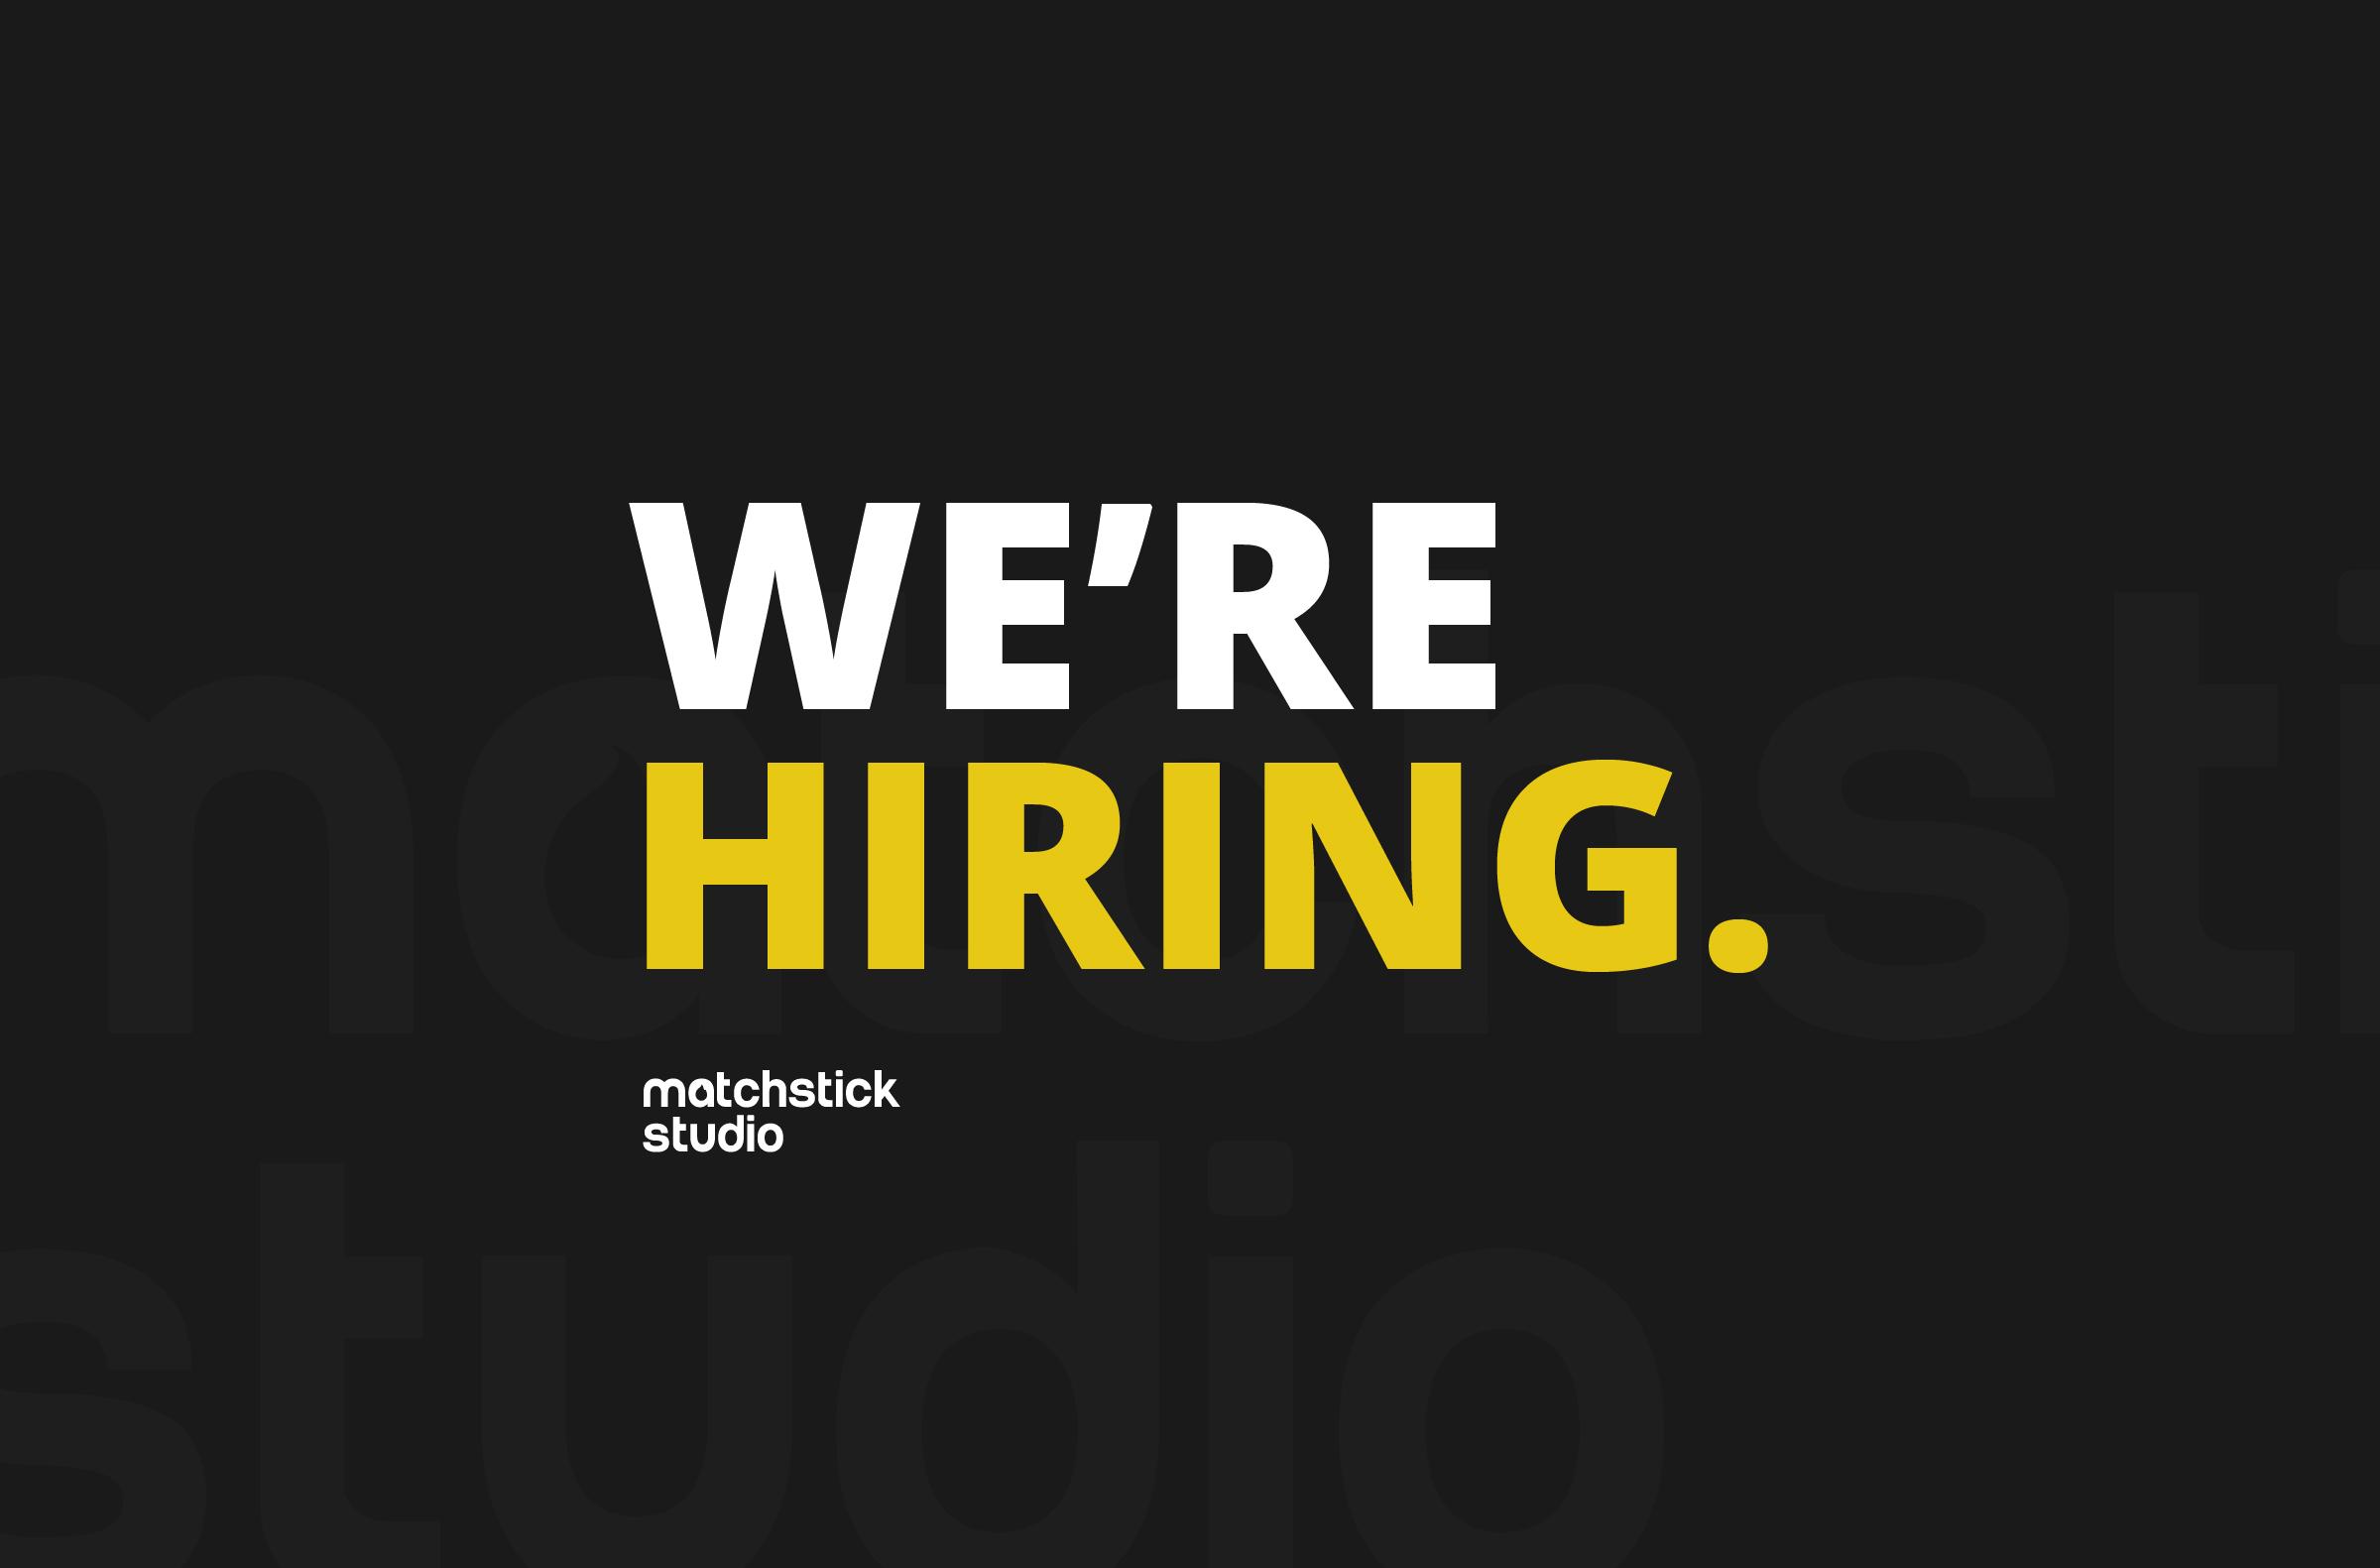 matchstick studio is hiring